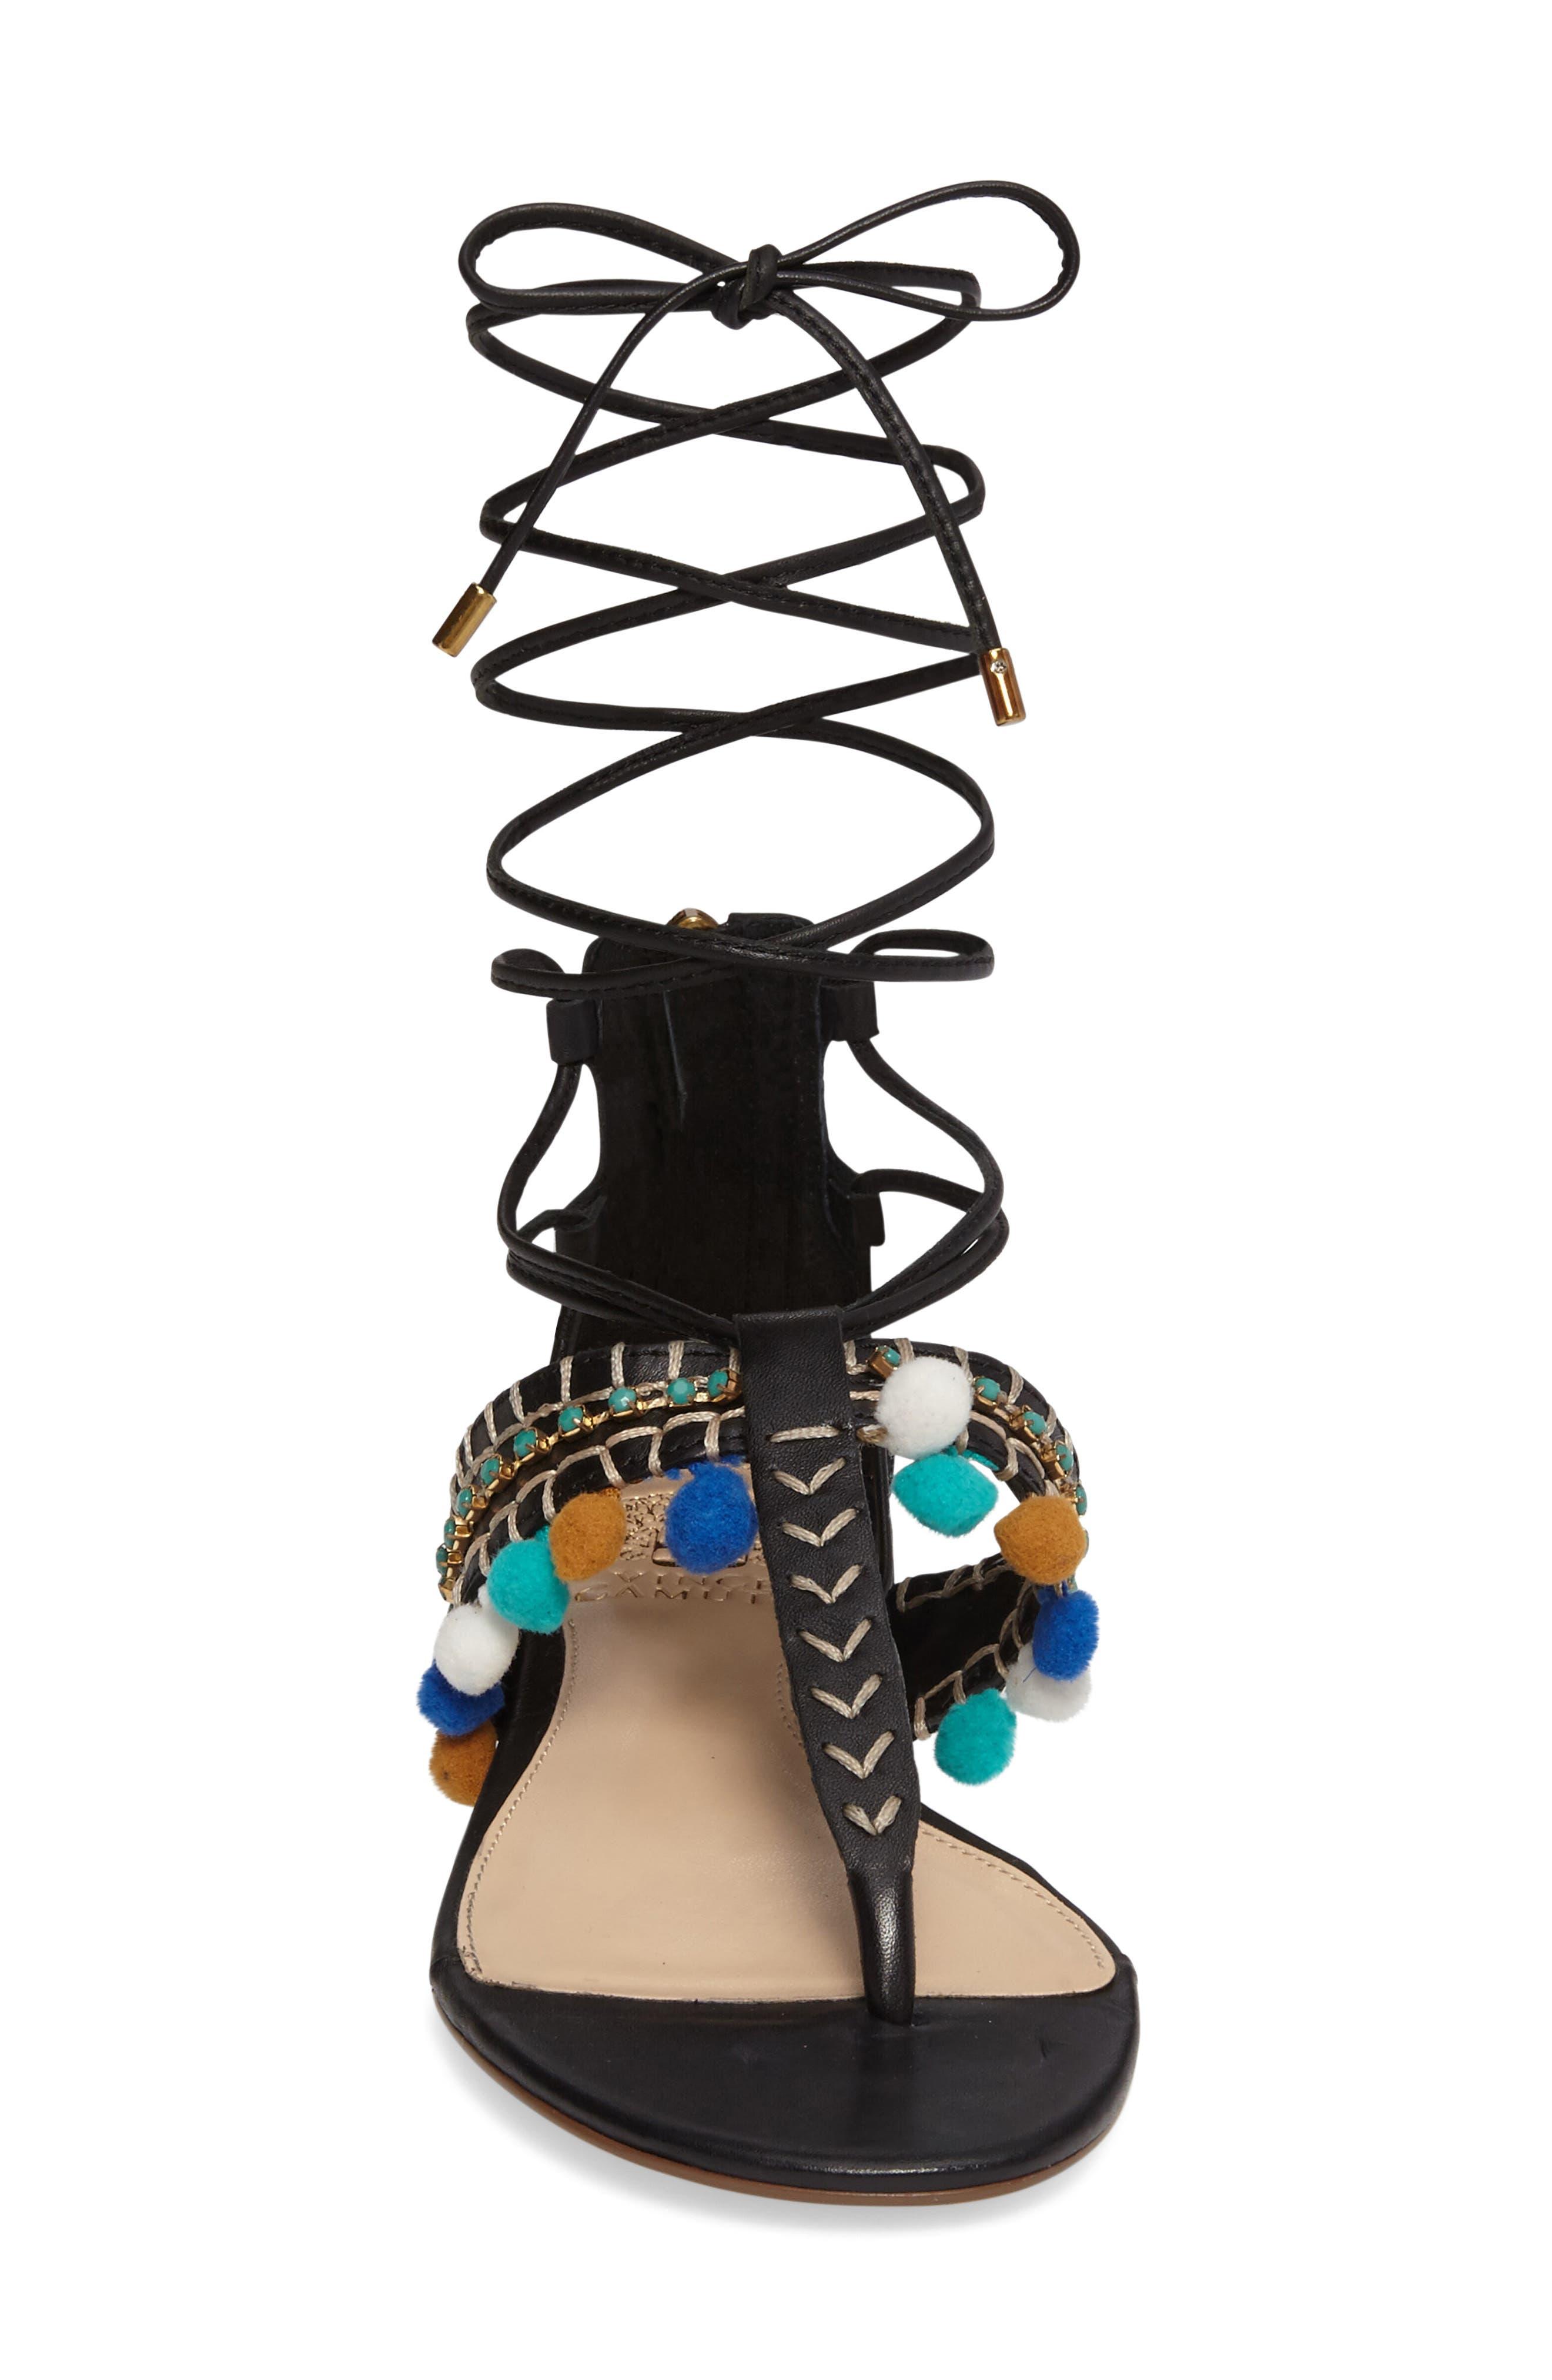 Balisa Embellished Lace-Up Sandal,                             Alternate thumbnail 3, color,                             001